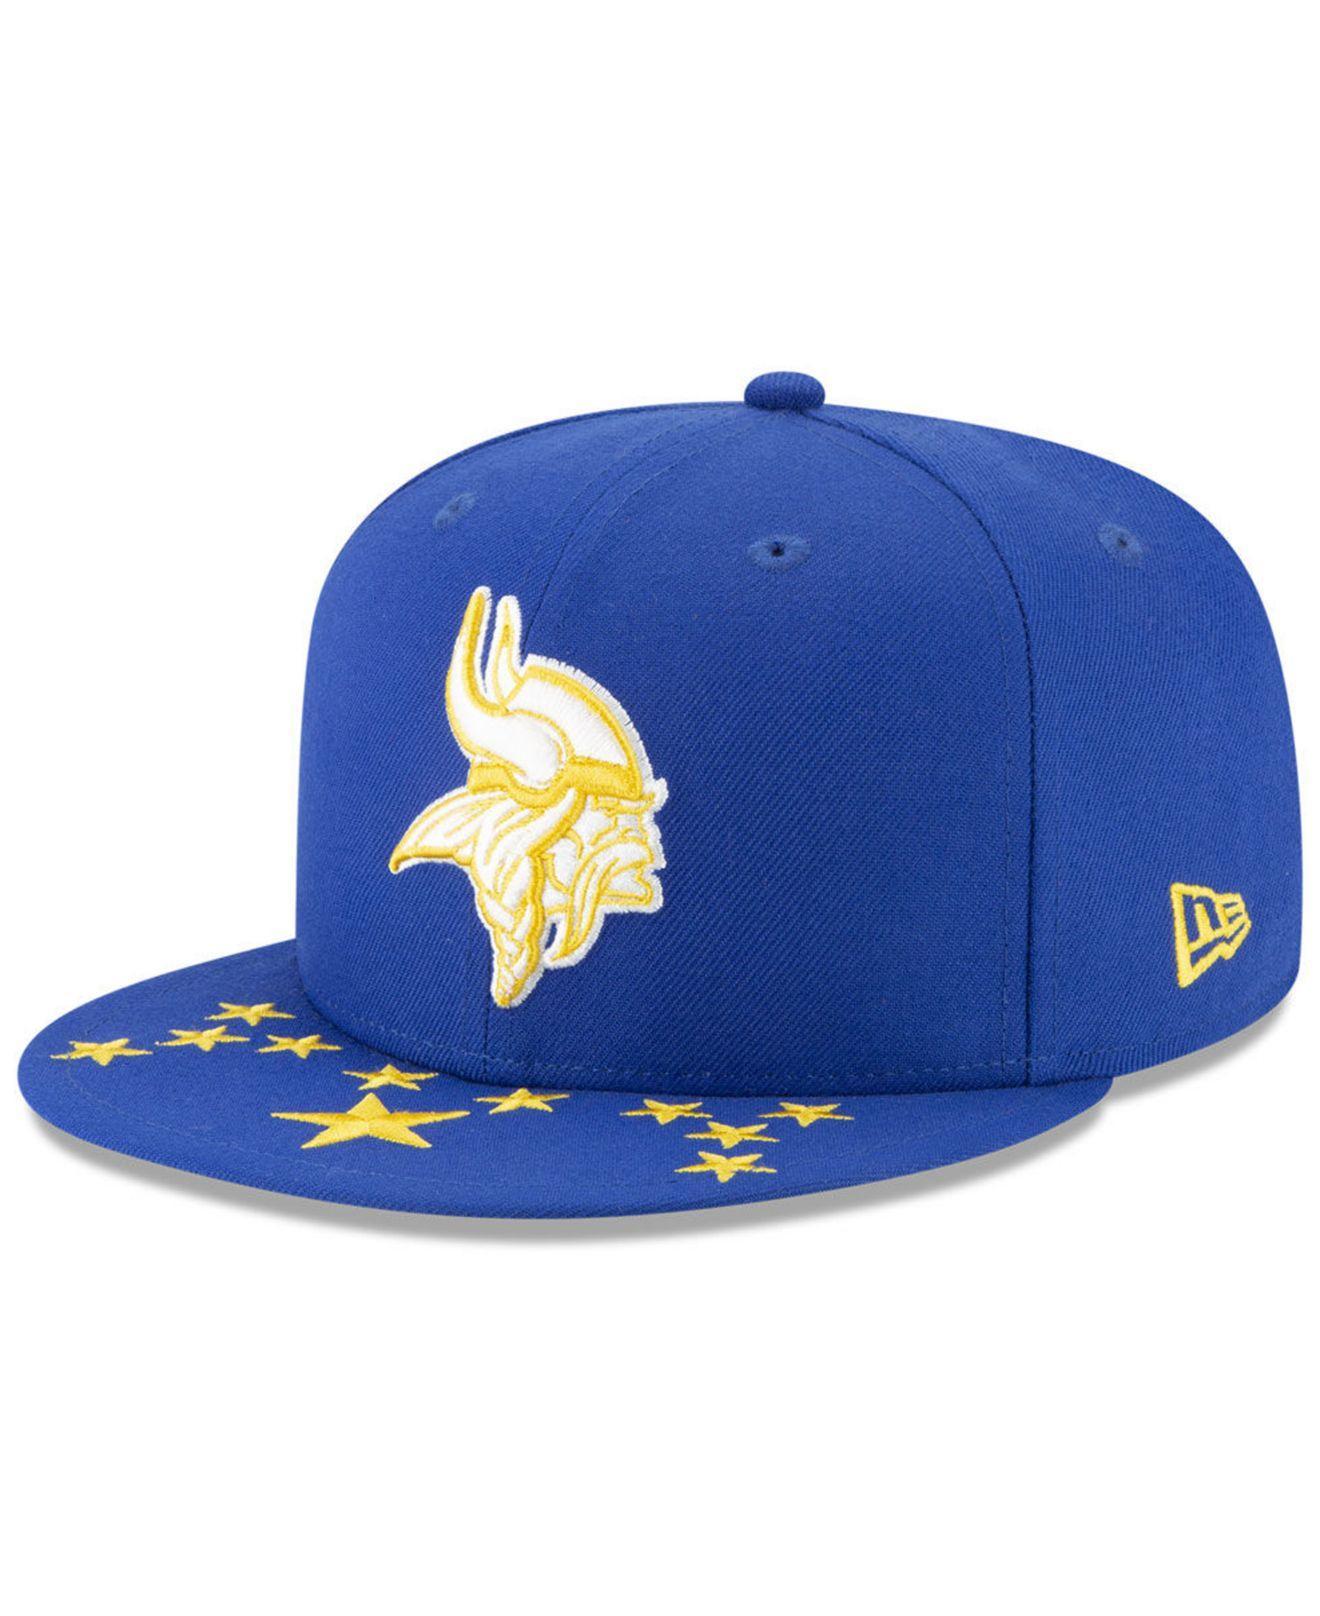 best website a1c12 82179 KTZ - Blue Minnesota Vikings Draft Spotlight 59fifty-fitted Cap for Men -  Lyst. View fullscreen